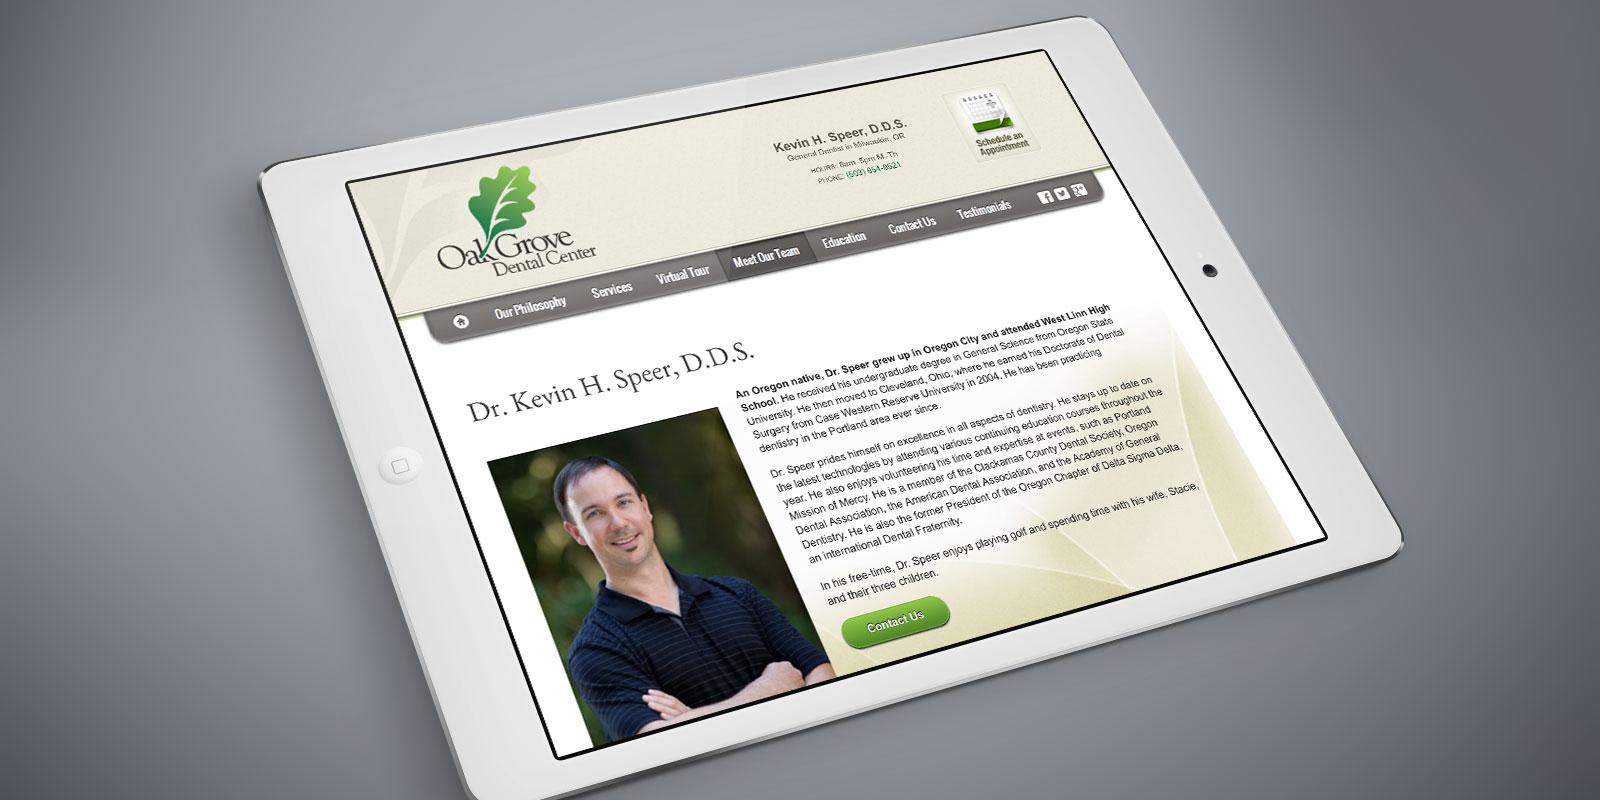 Oak Grove Dental Center website on a tablet